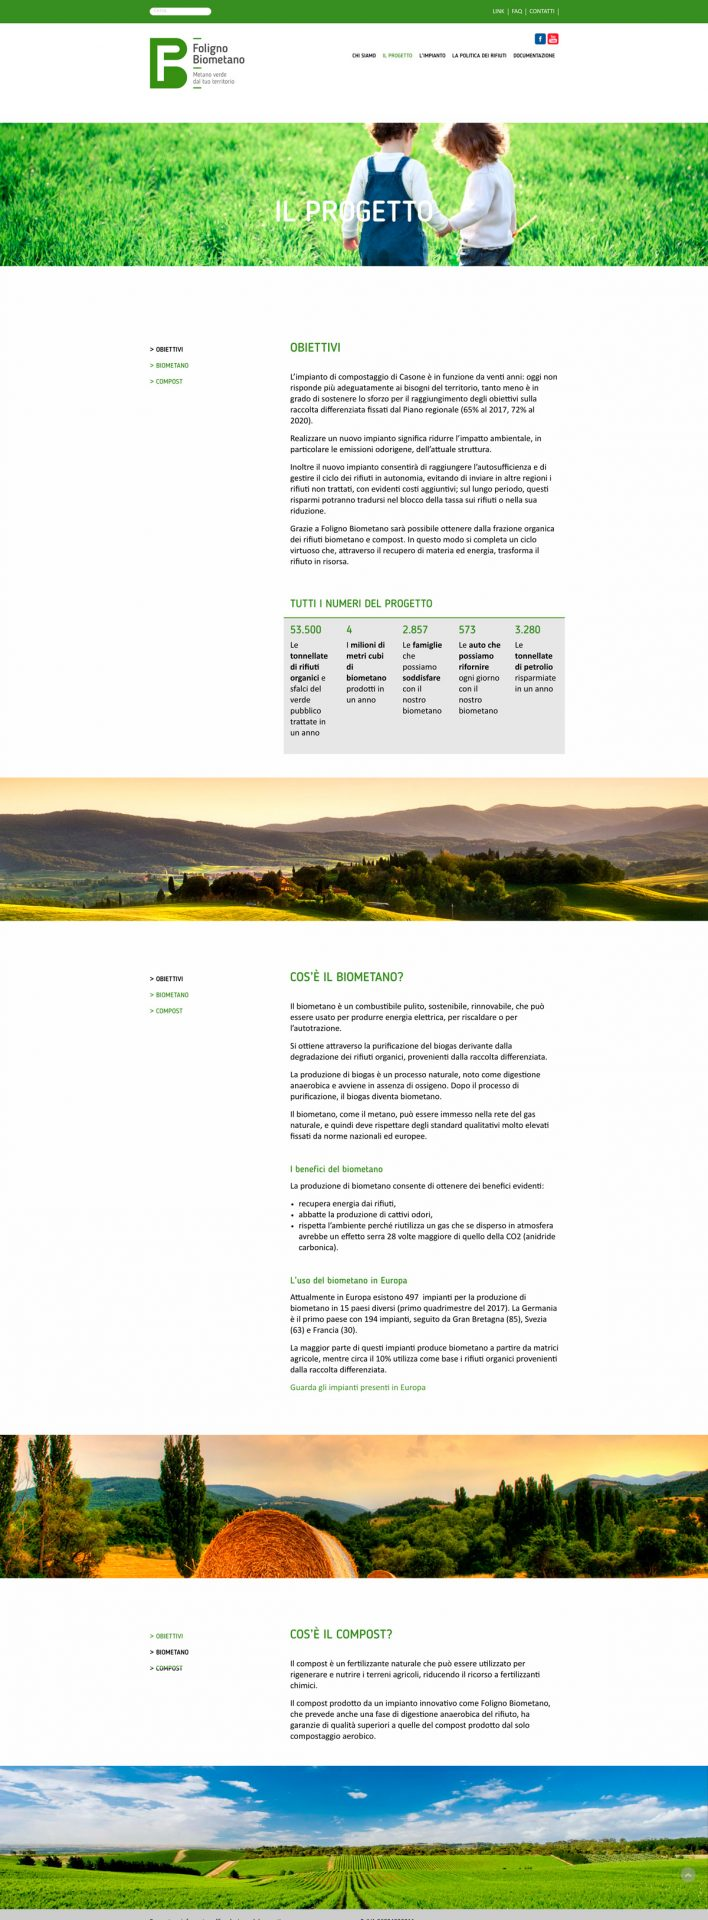 Kreas website folignobiometano 02